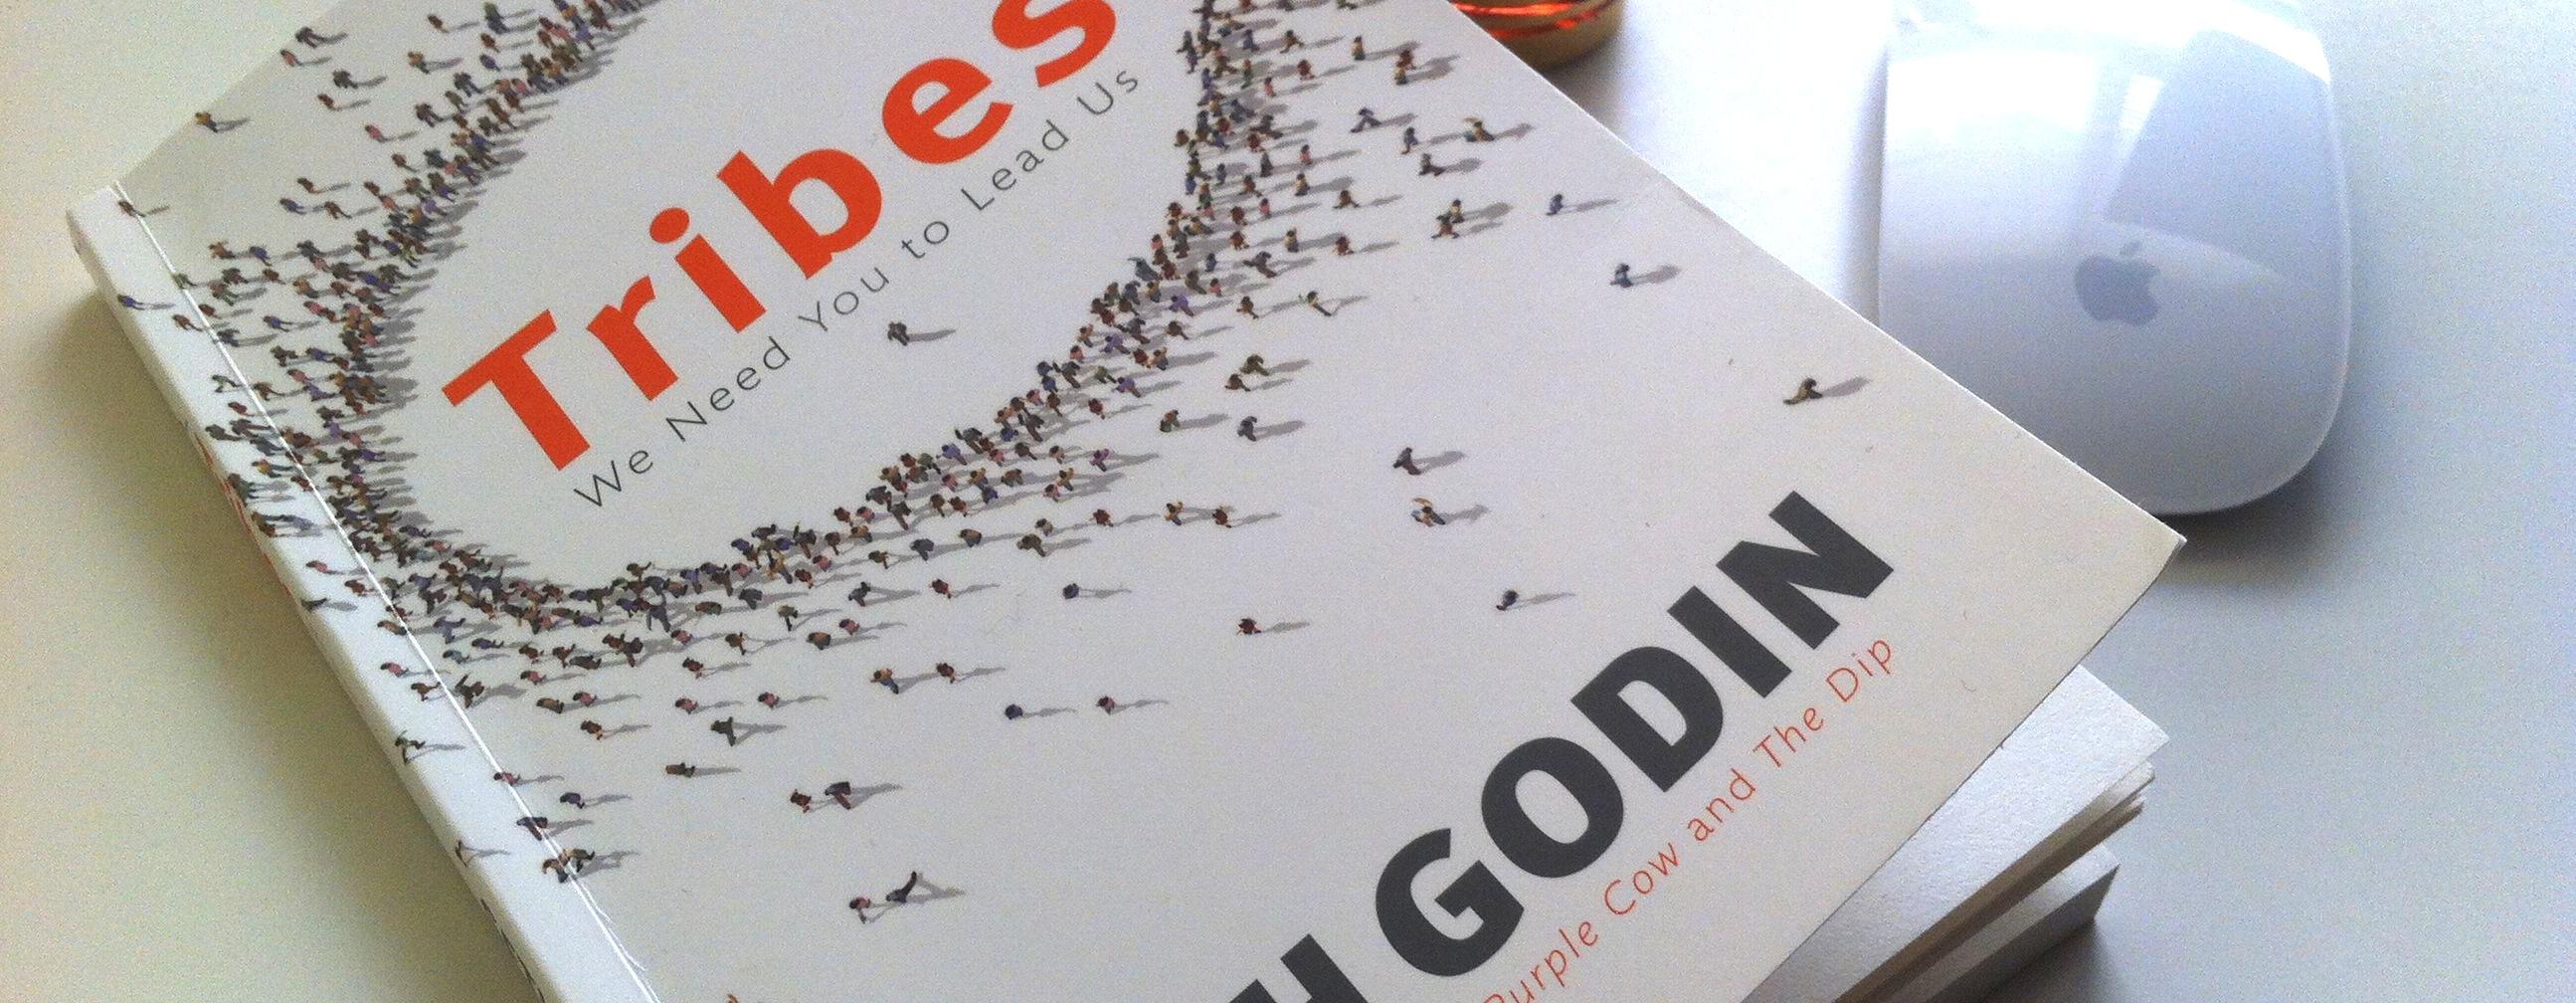 Tribus Seth Godin